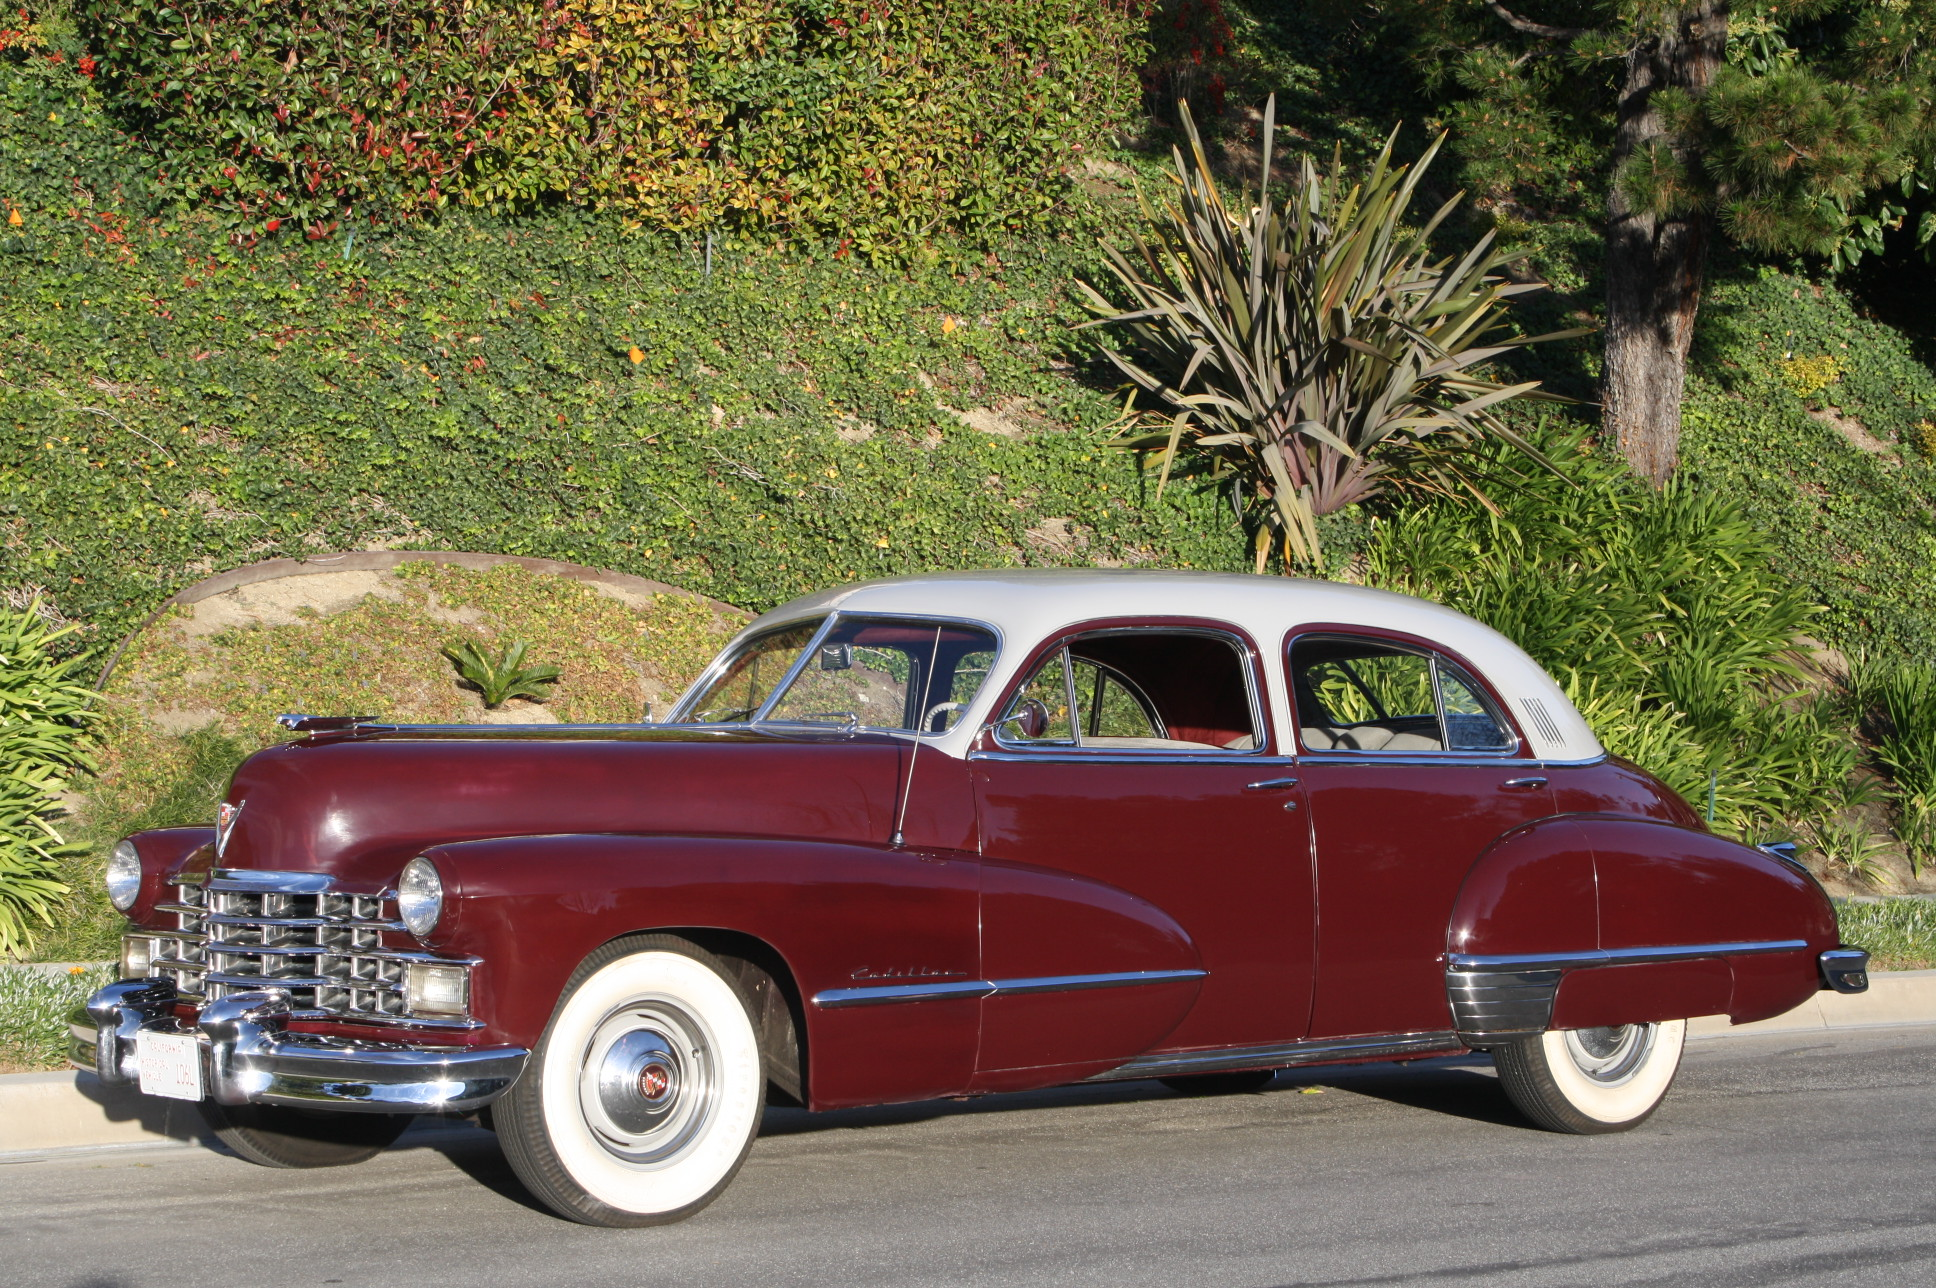 1947 Cadillac | The Vault Clic Cars